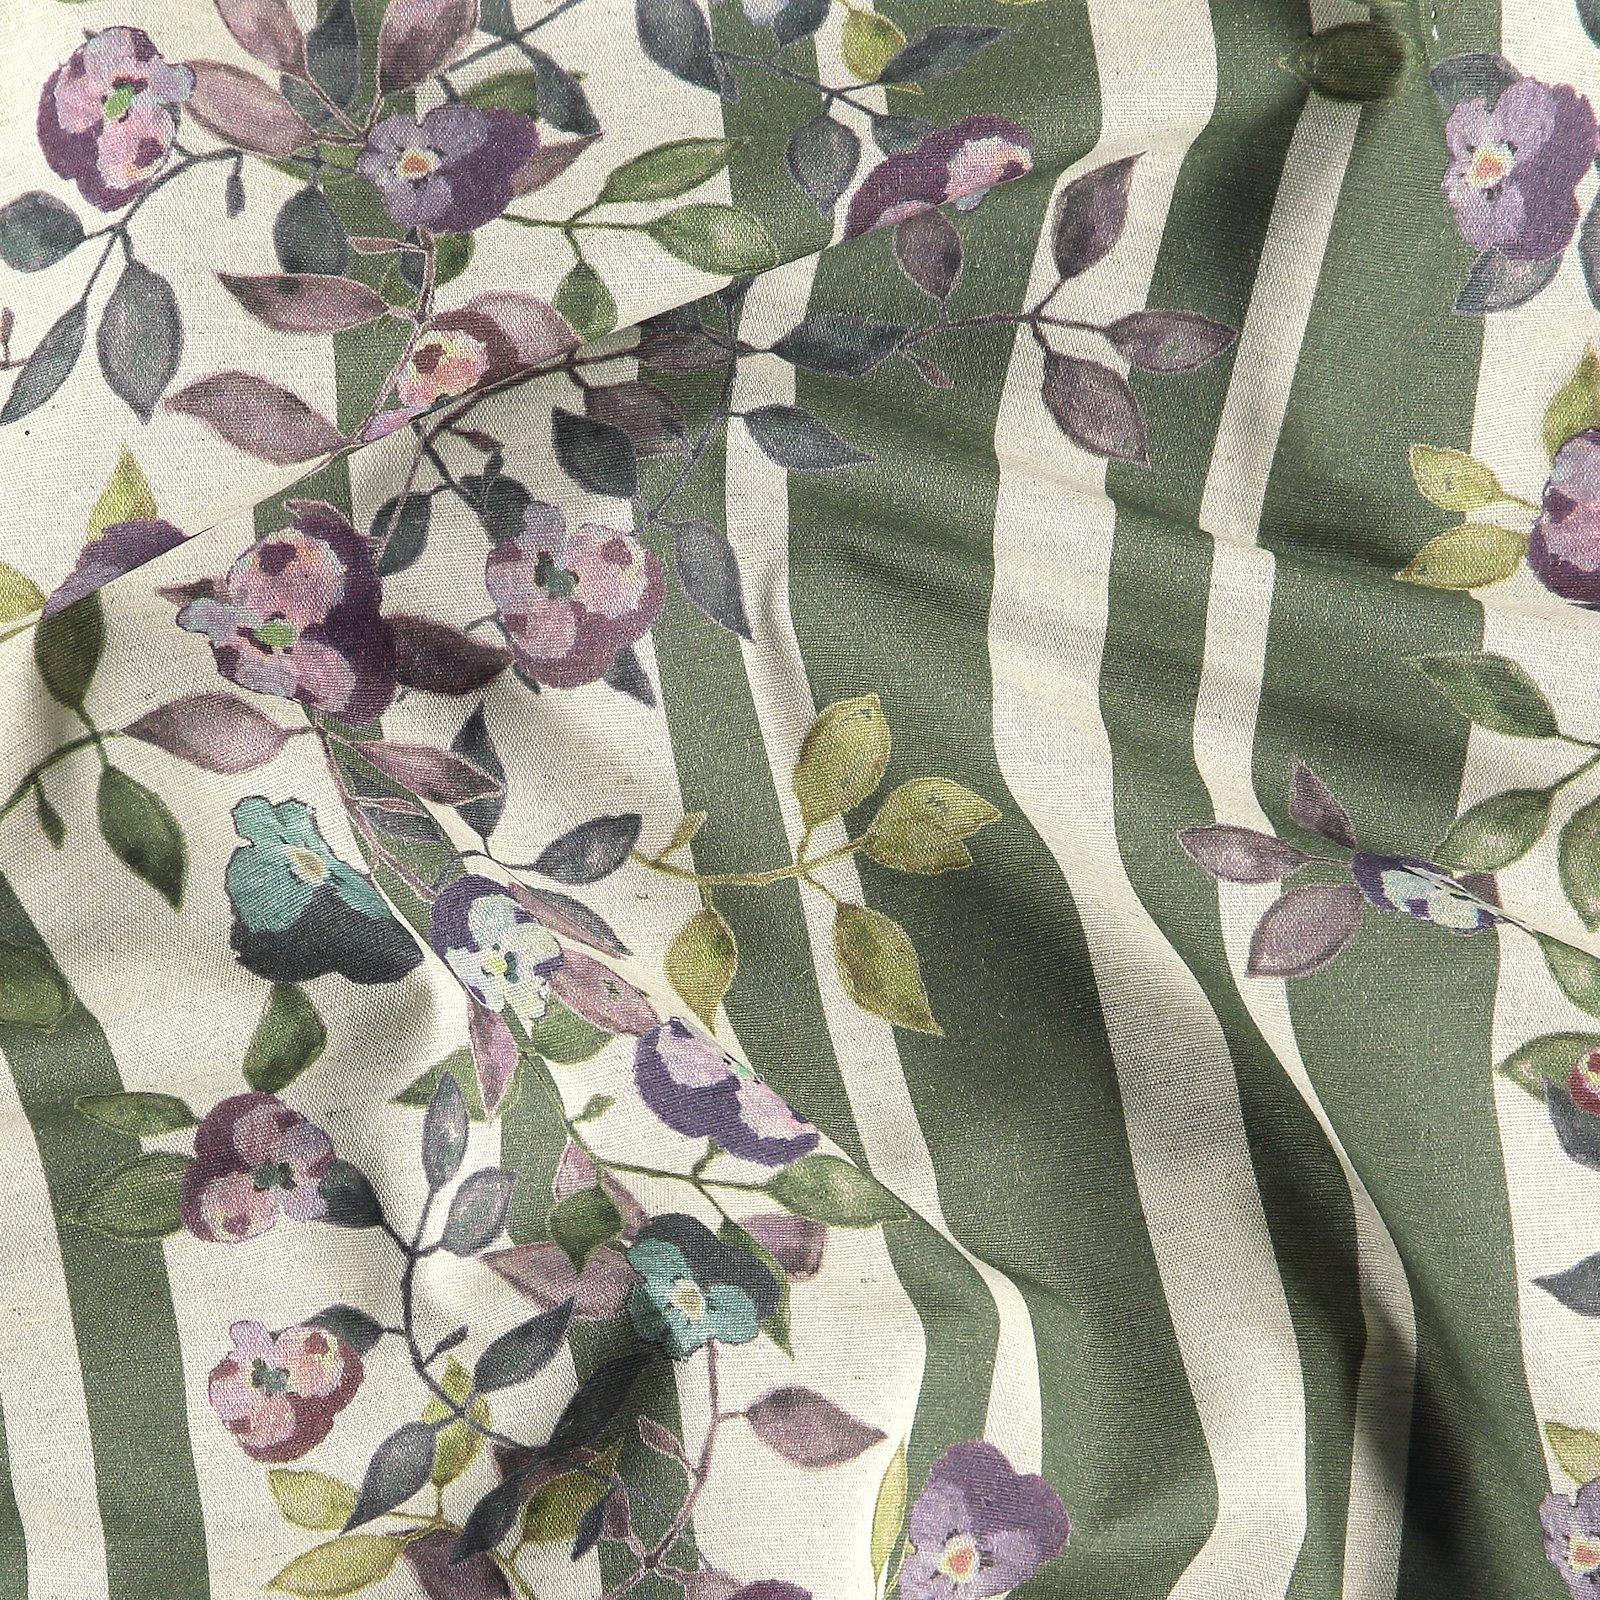 Woven cotton/linen green/rose w flowers 780576_pack